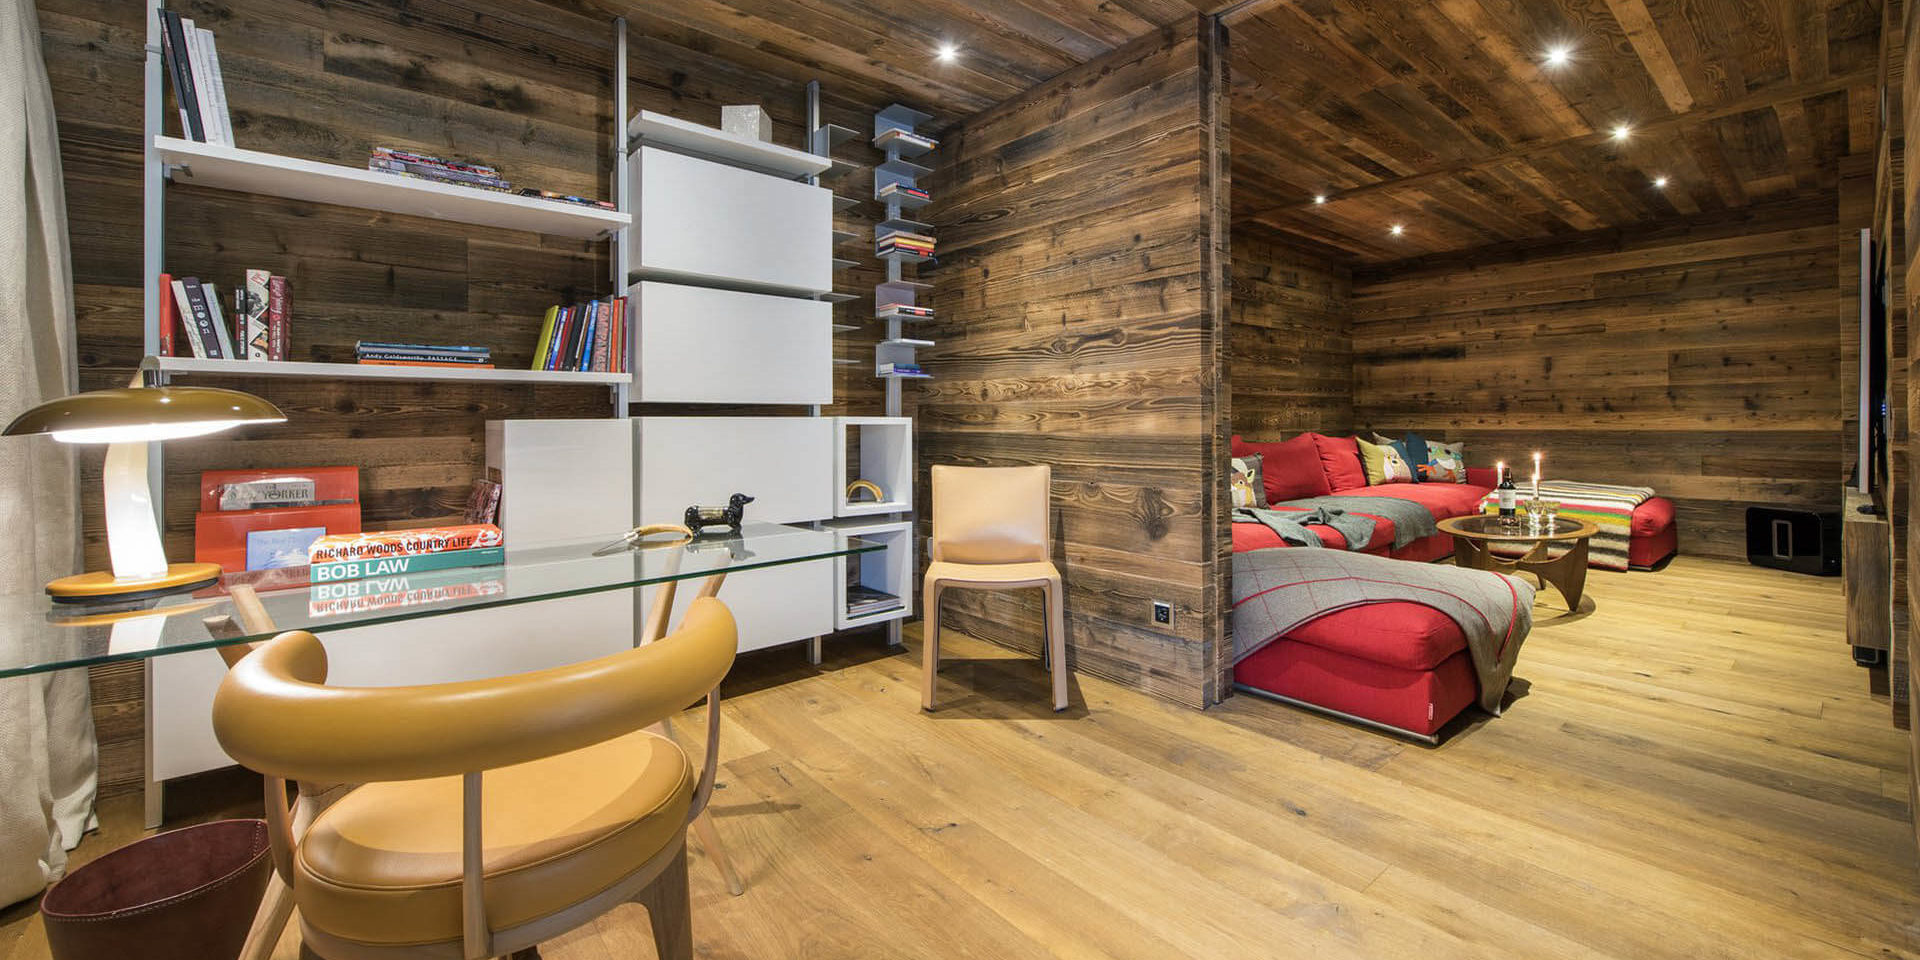 Appartement Place Blanche Verbier Les 4 Vallees Zwitserland wintersport skivakantie luxe TV kamer rode hoekbank bureau lamp kast boeken stoel hout